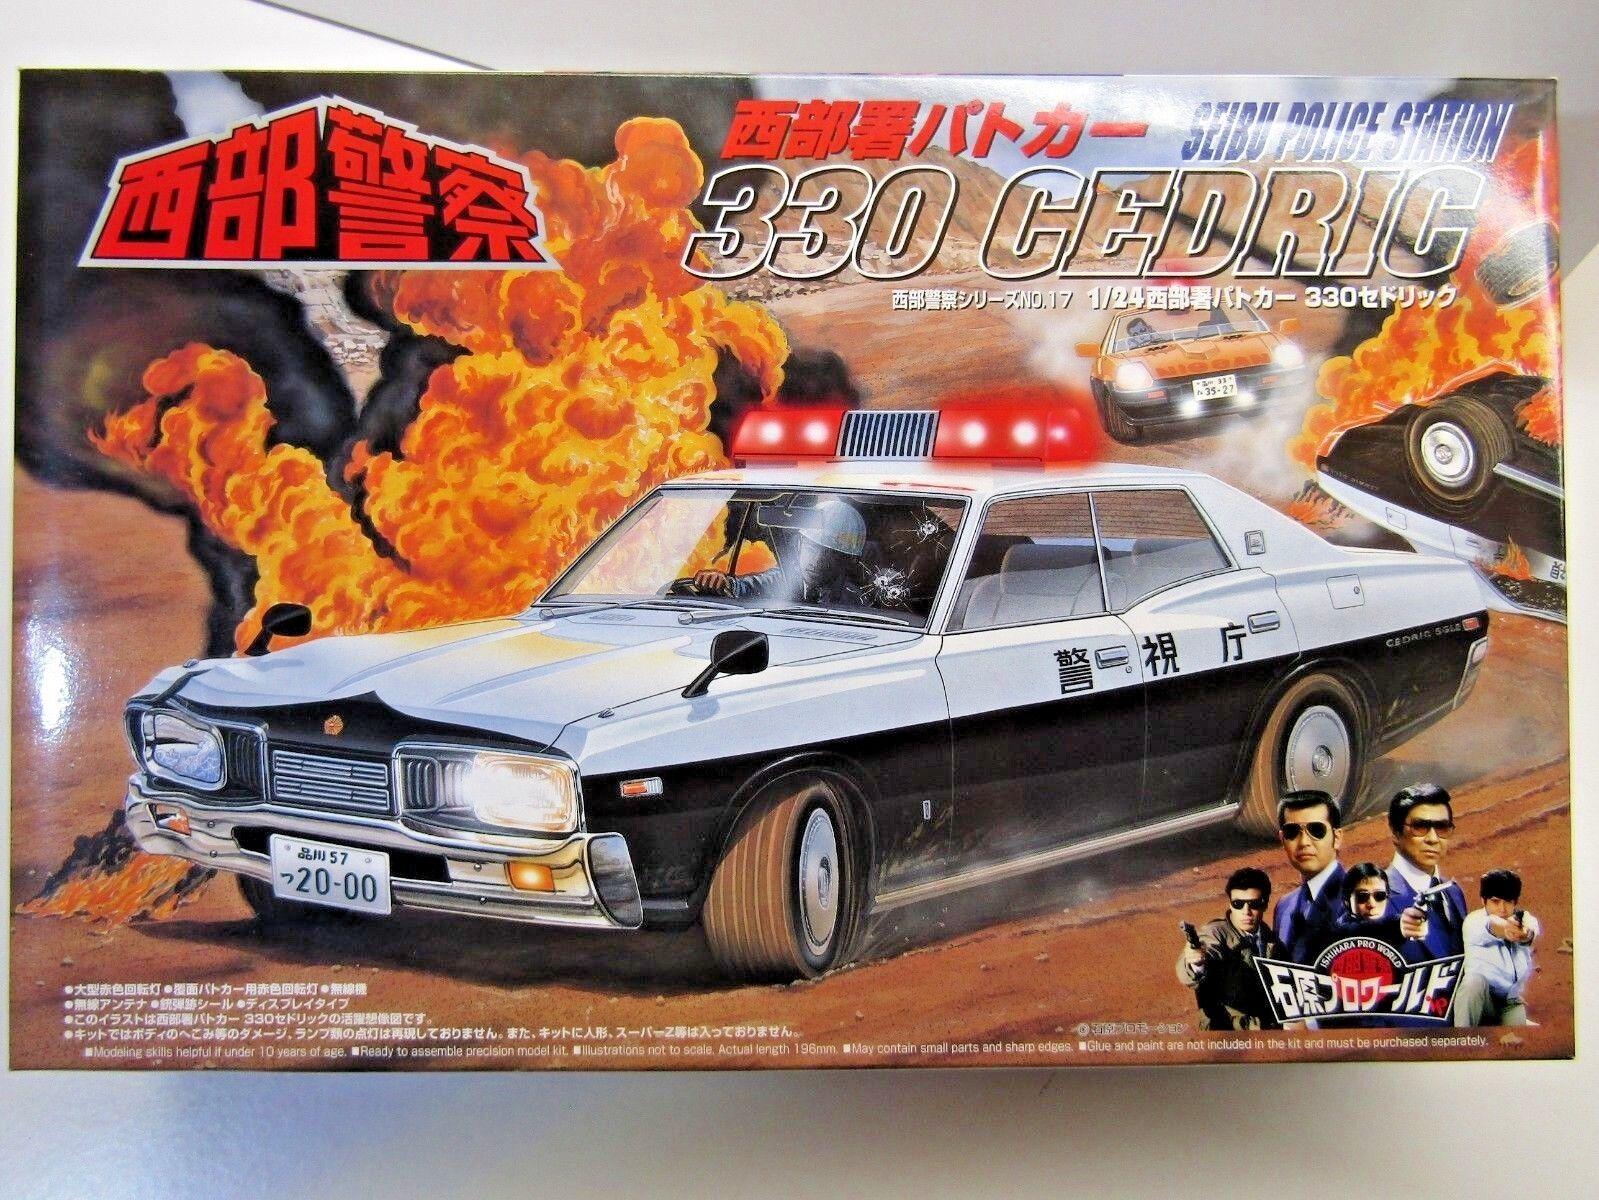 Aoshima 24 skala  ishihara pro welt  seibu polizei stn 330 cedric modell kit